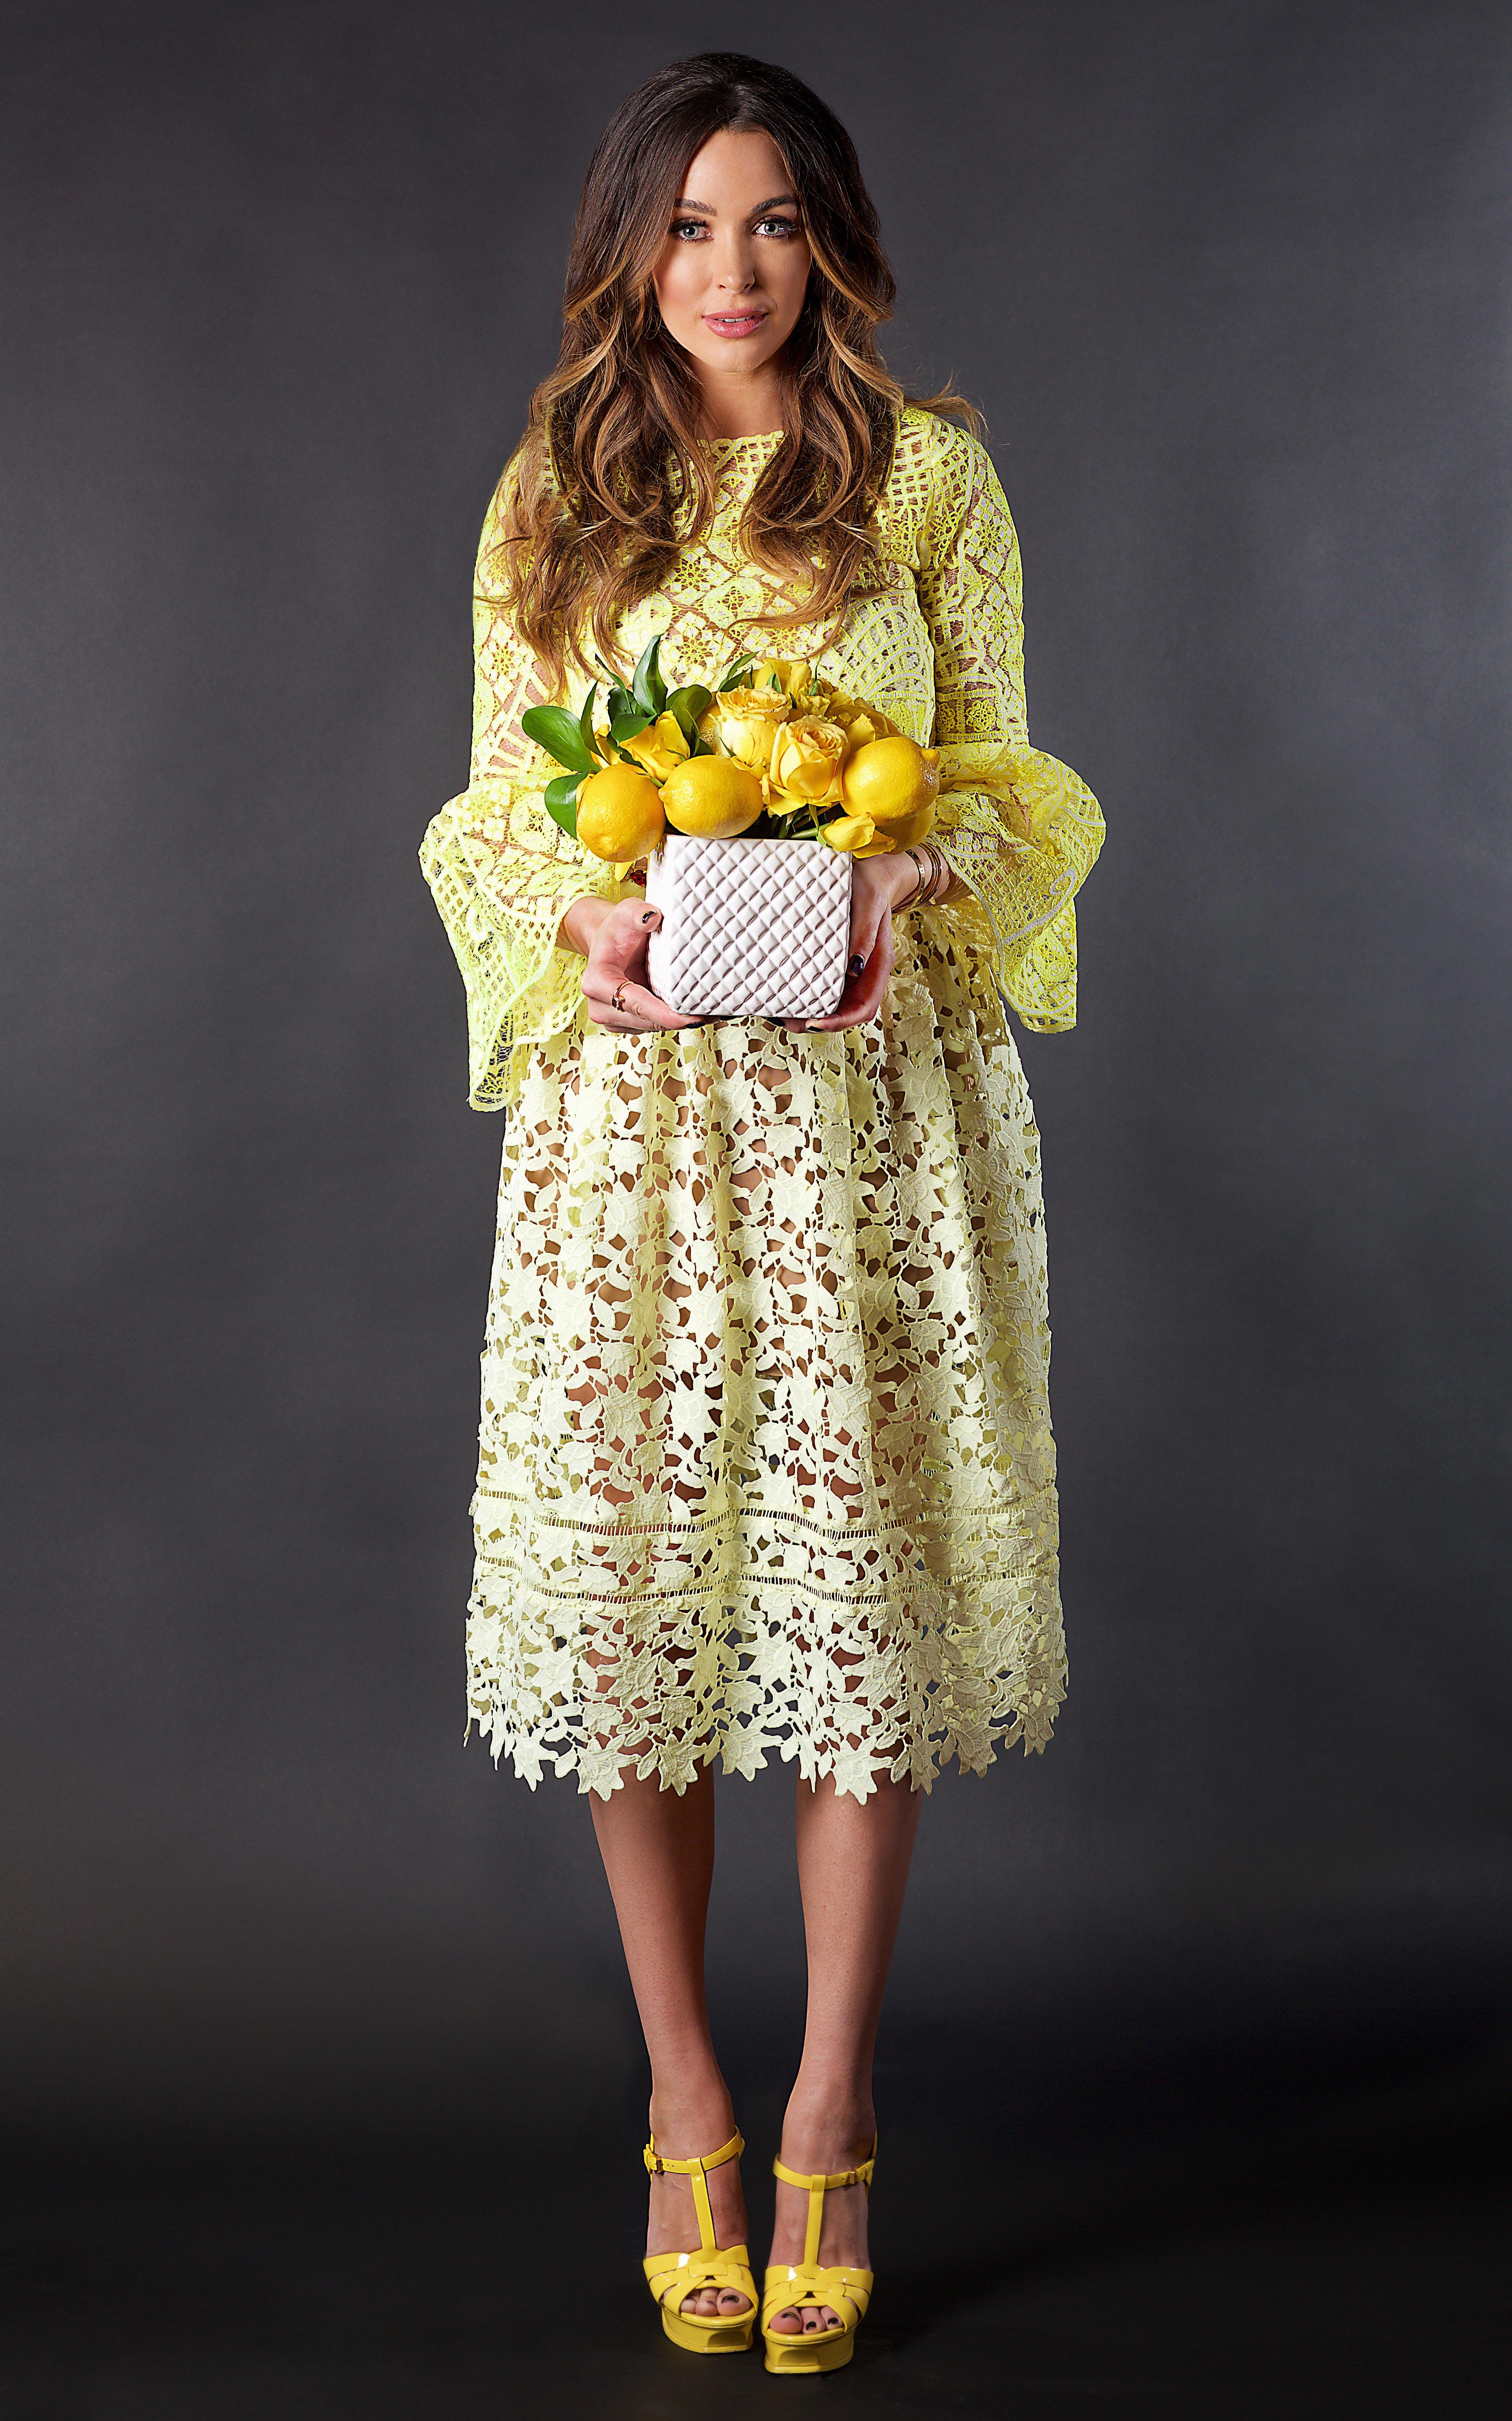 citrus centerpiece yellow lemons